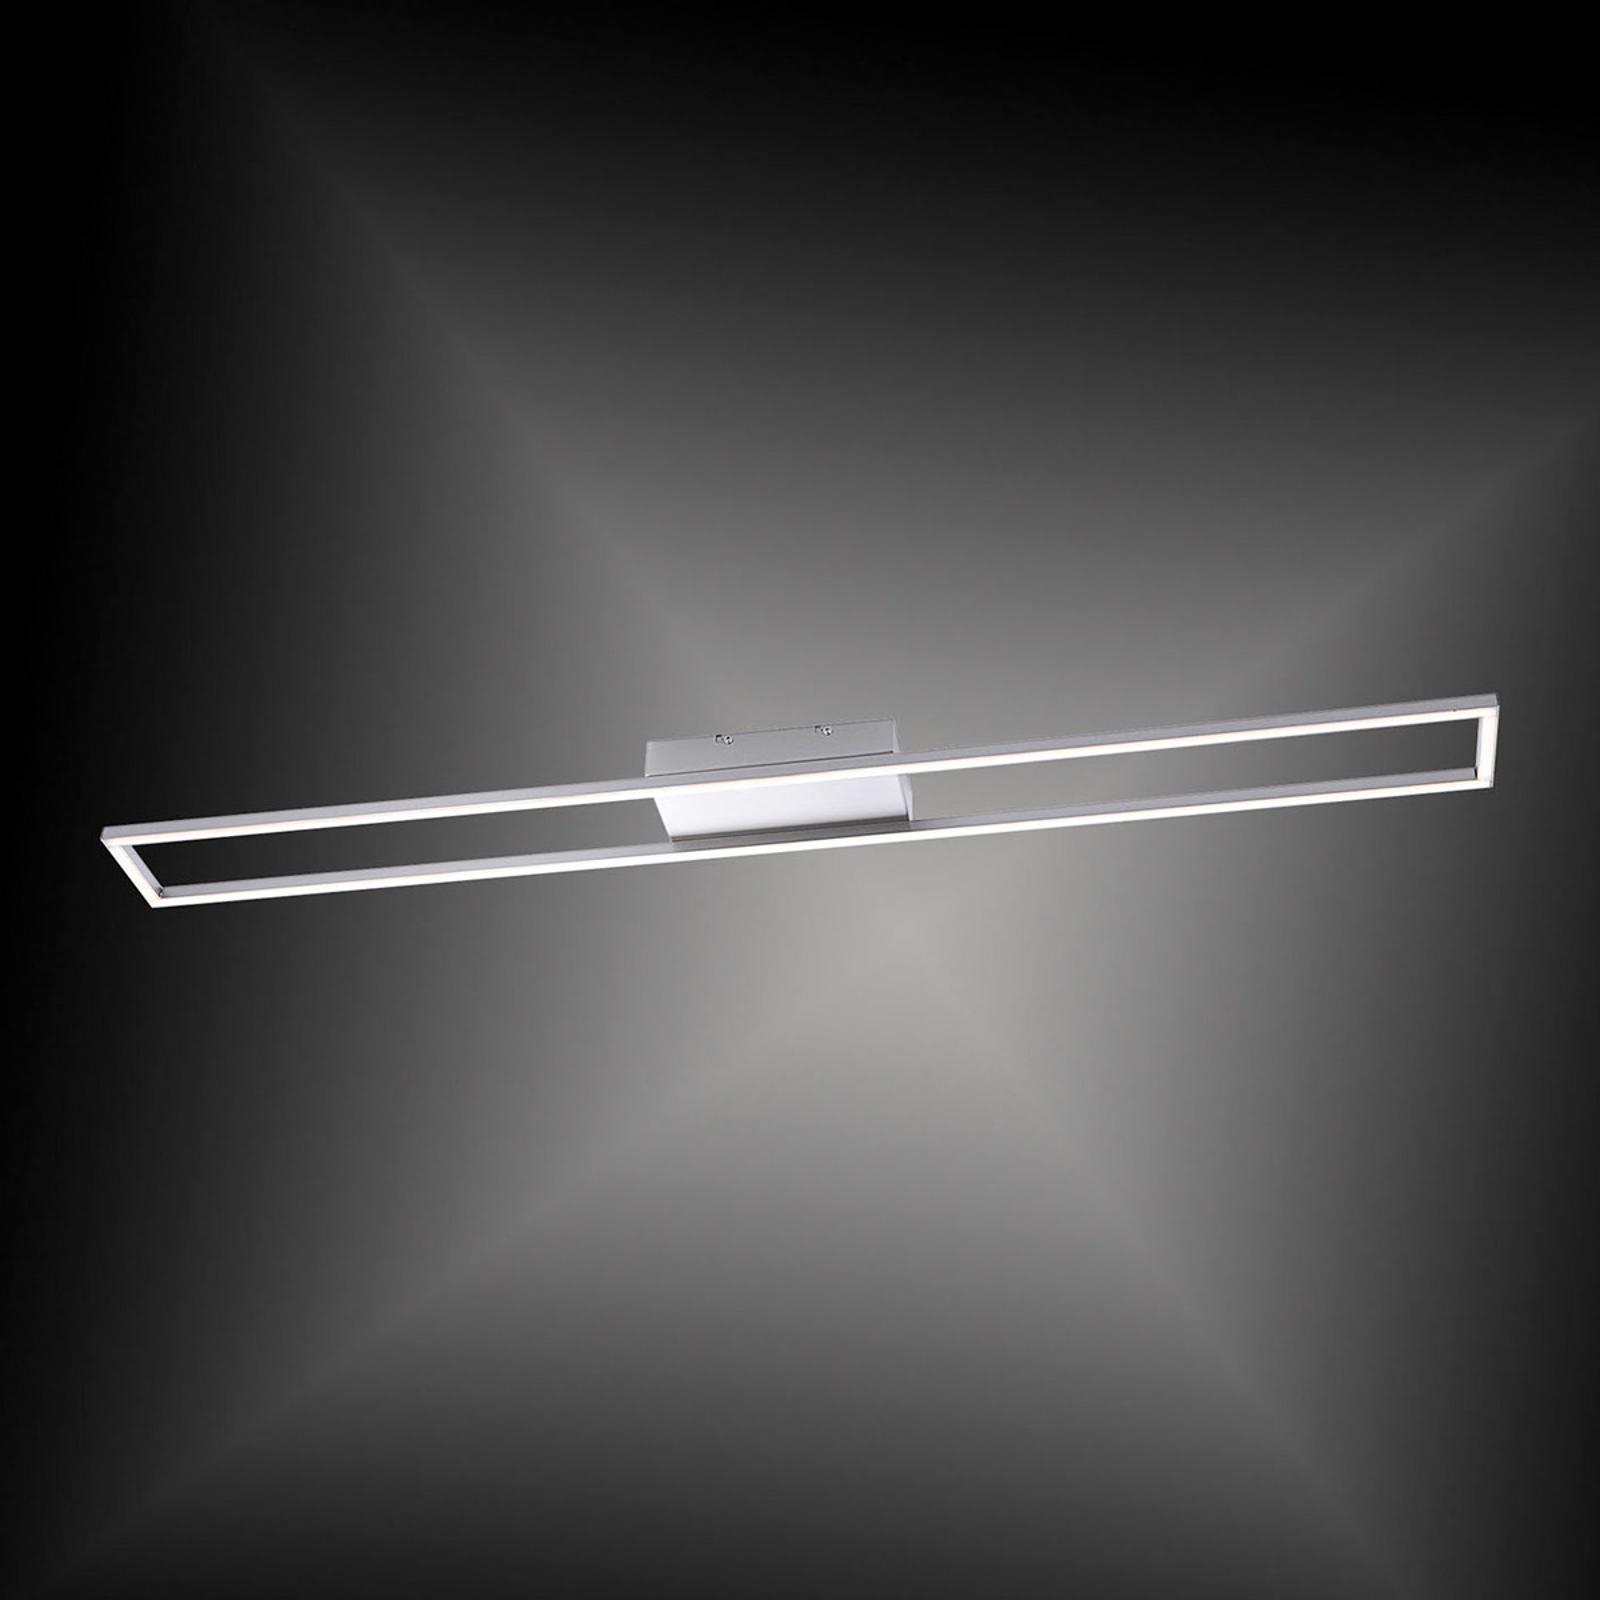 Plafoniera LED Inigo 110 cm